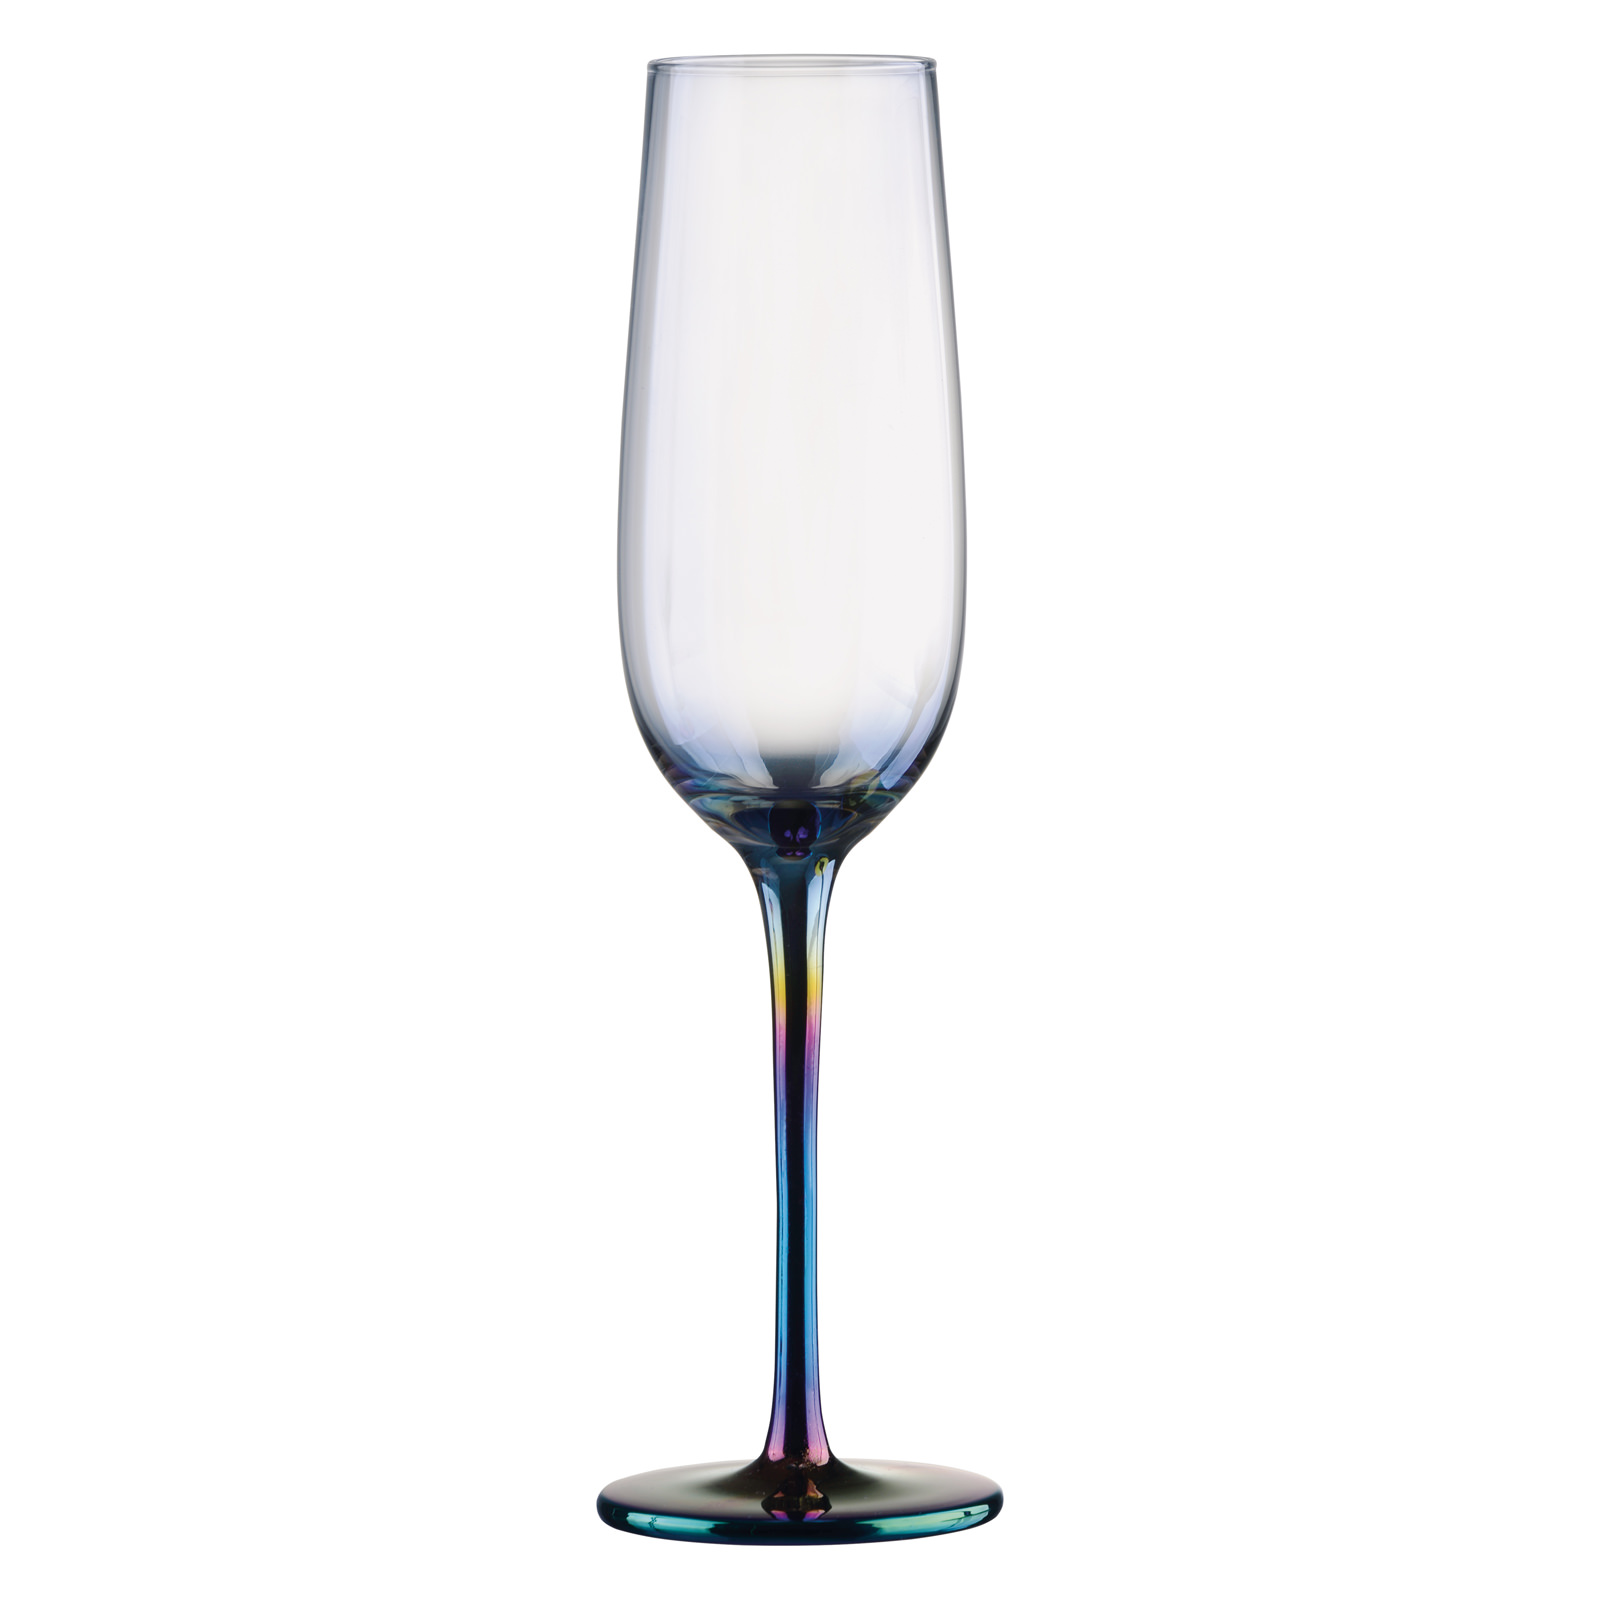 Mirage Champagne Flutes